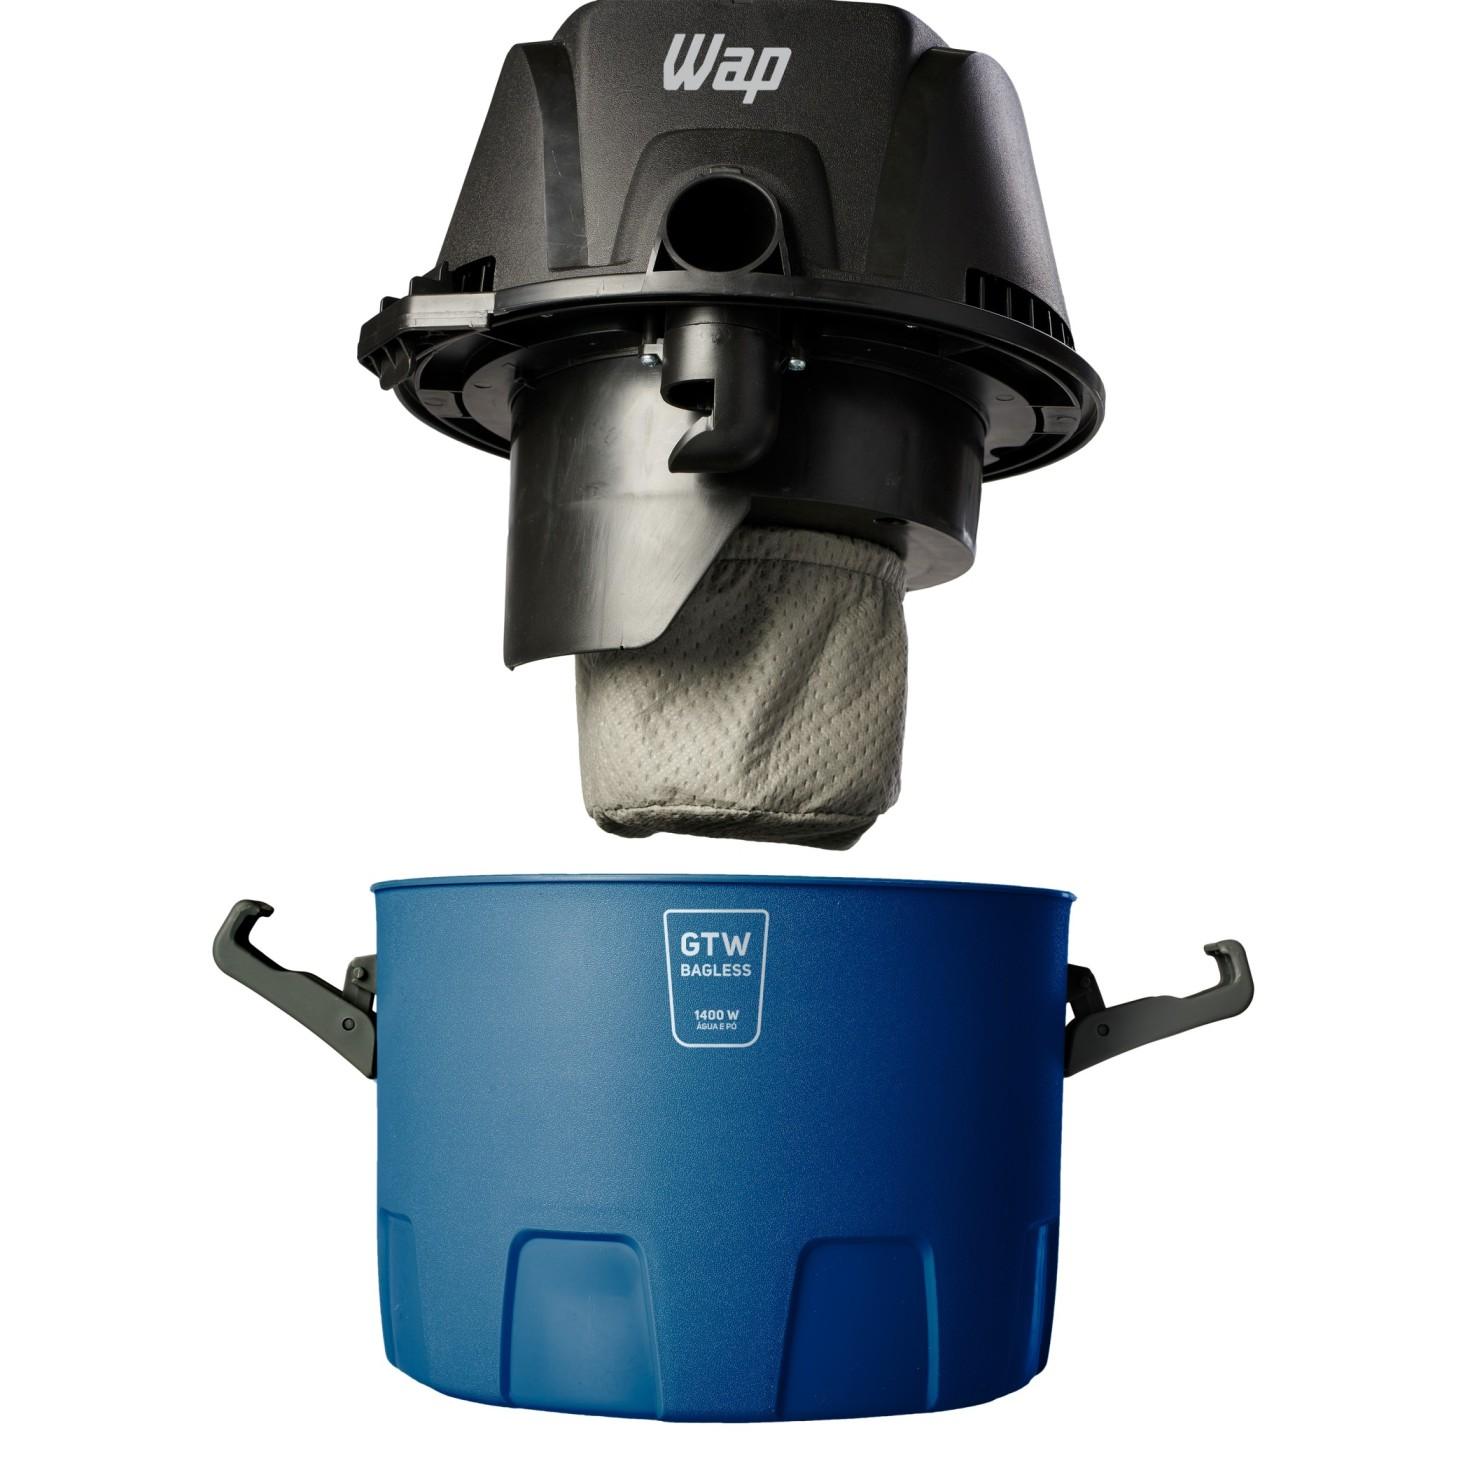 Aspirador GTW Bagless - Wap